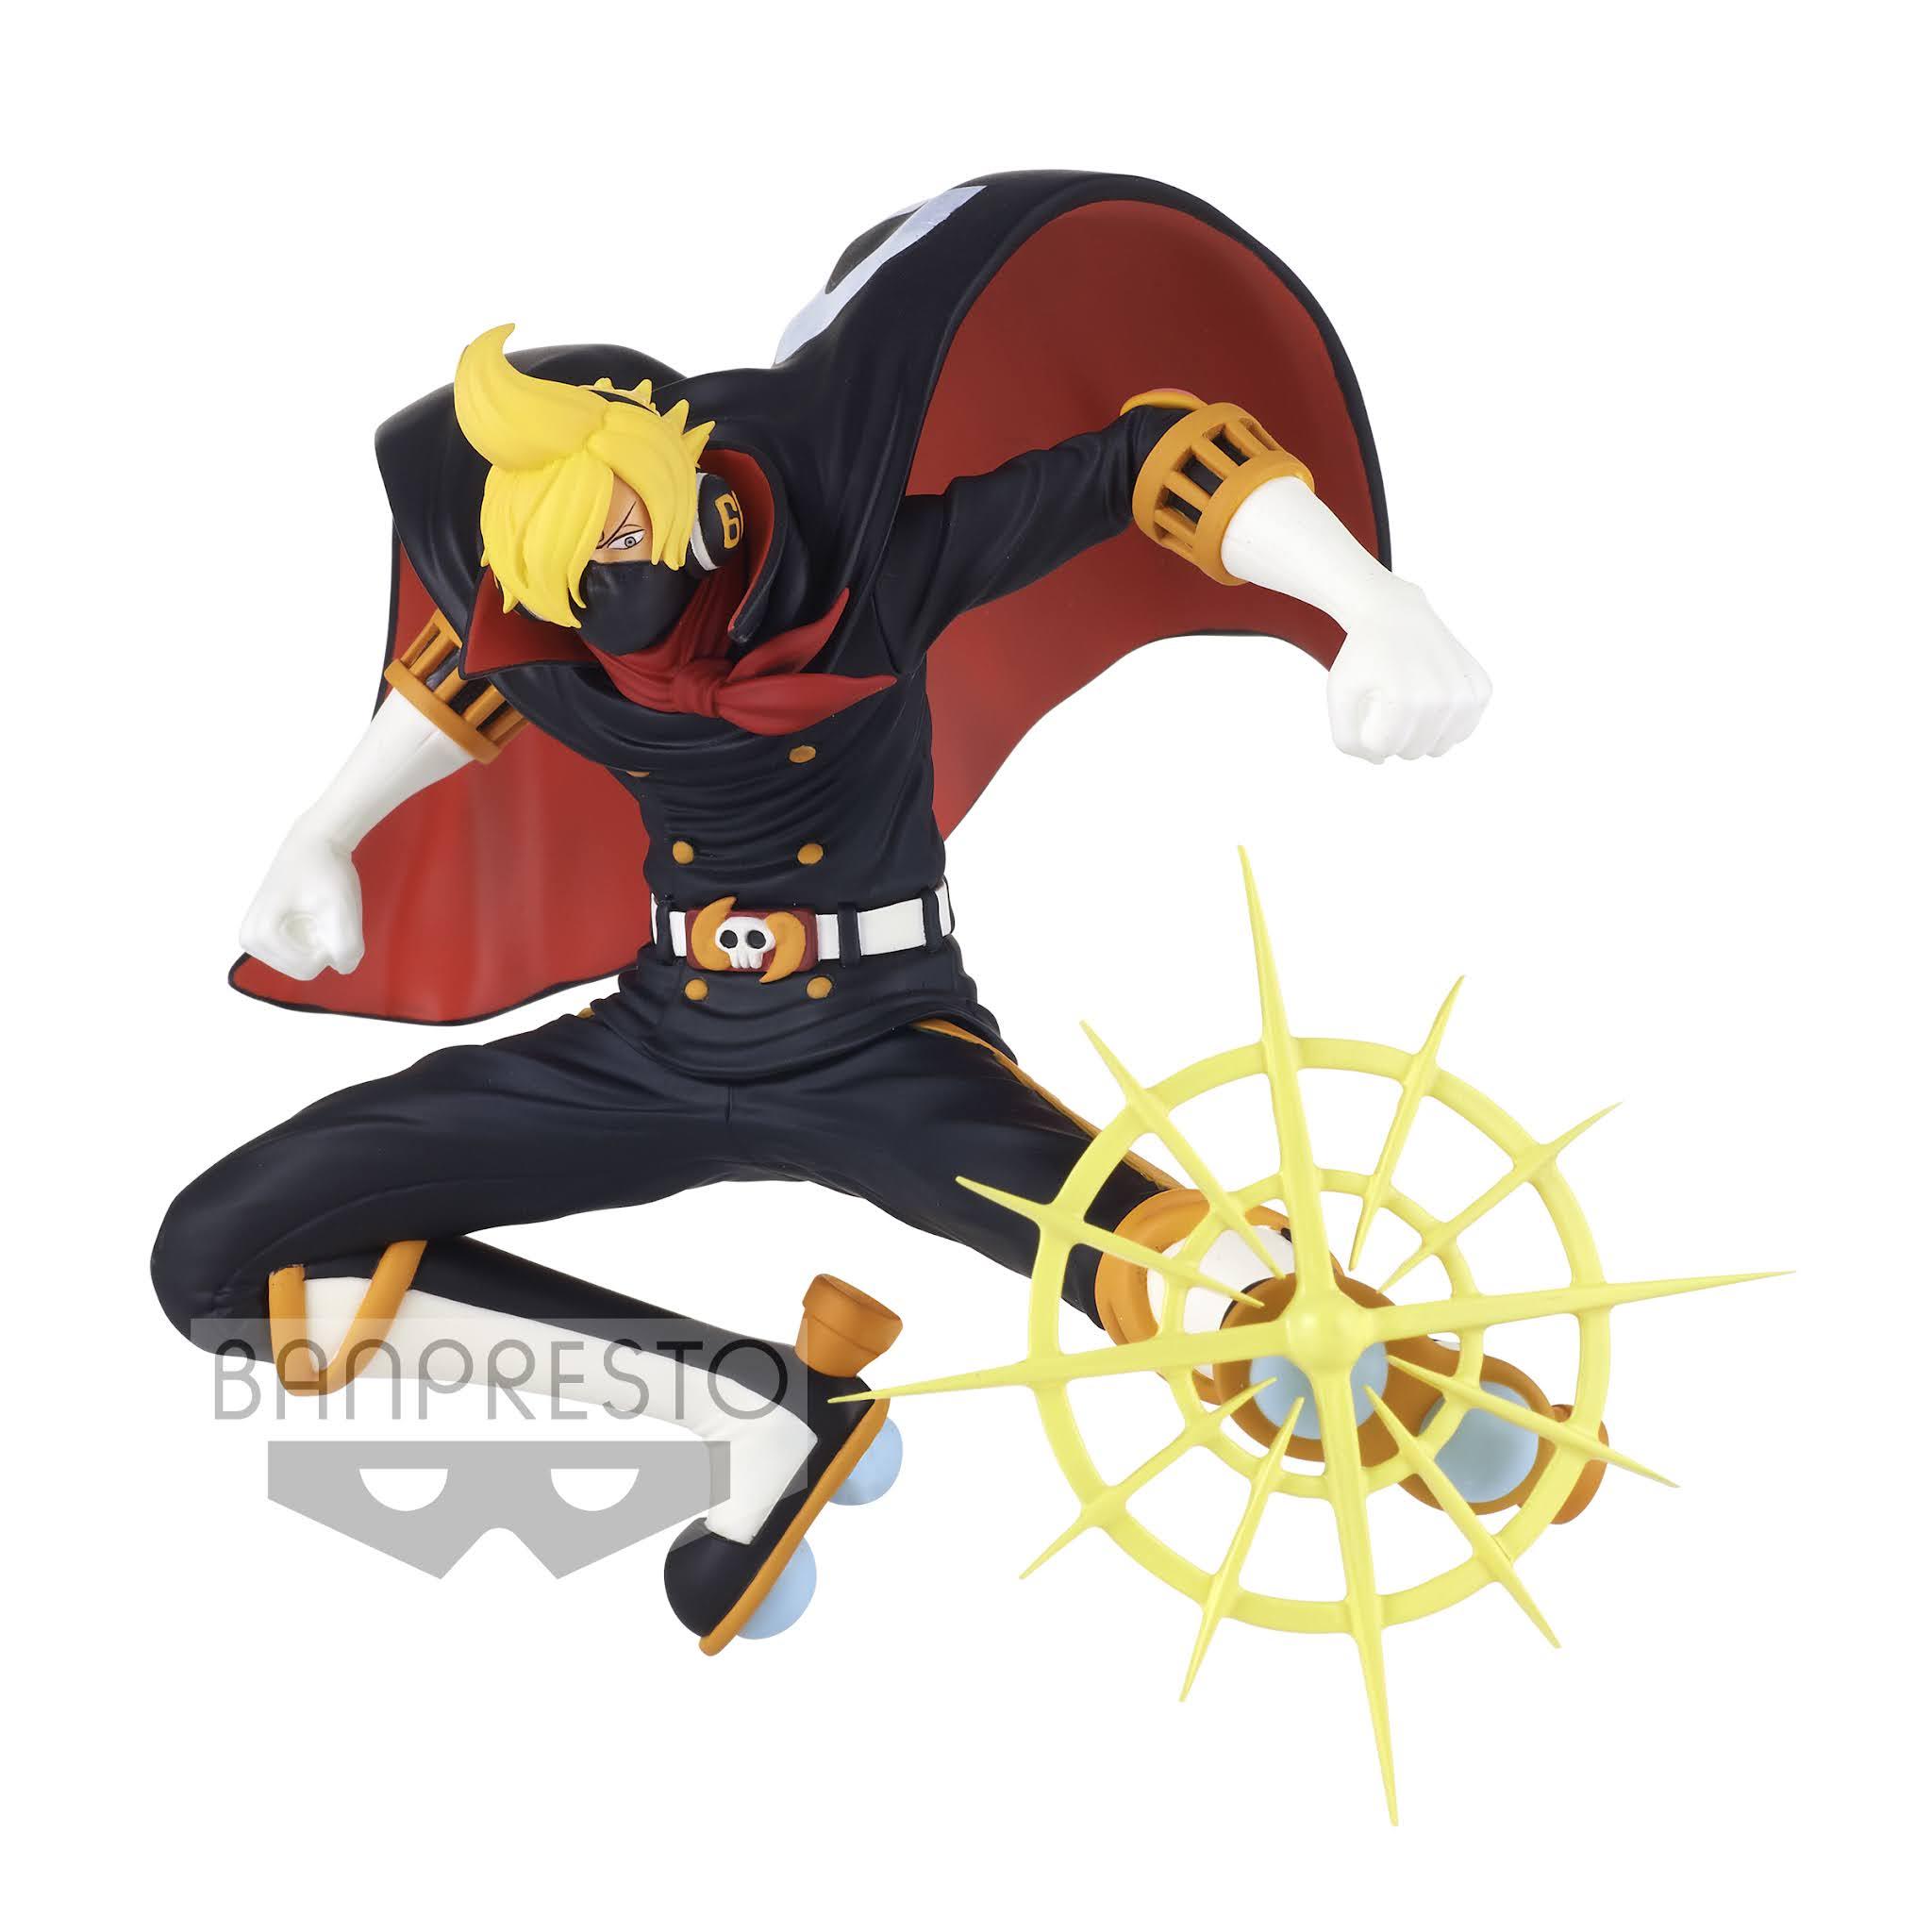 One Piece - Osoba Mask Battle Record Collection (Banpresto)